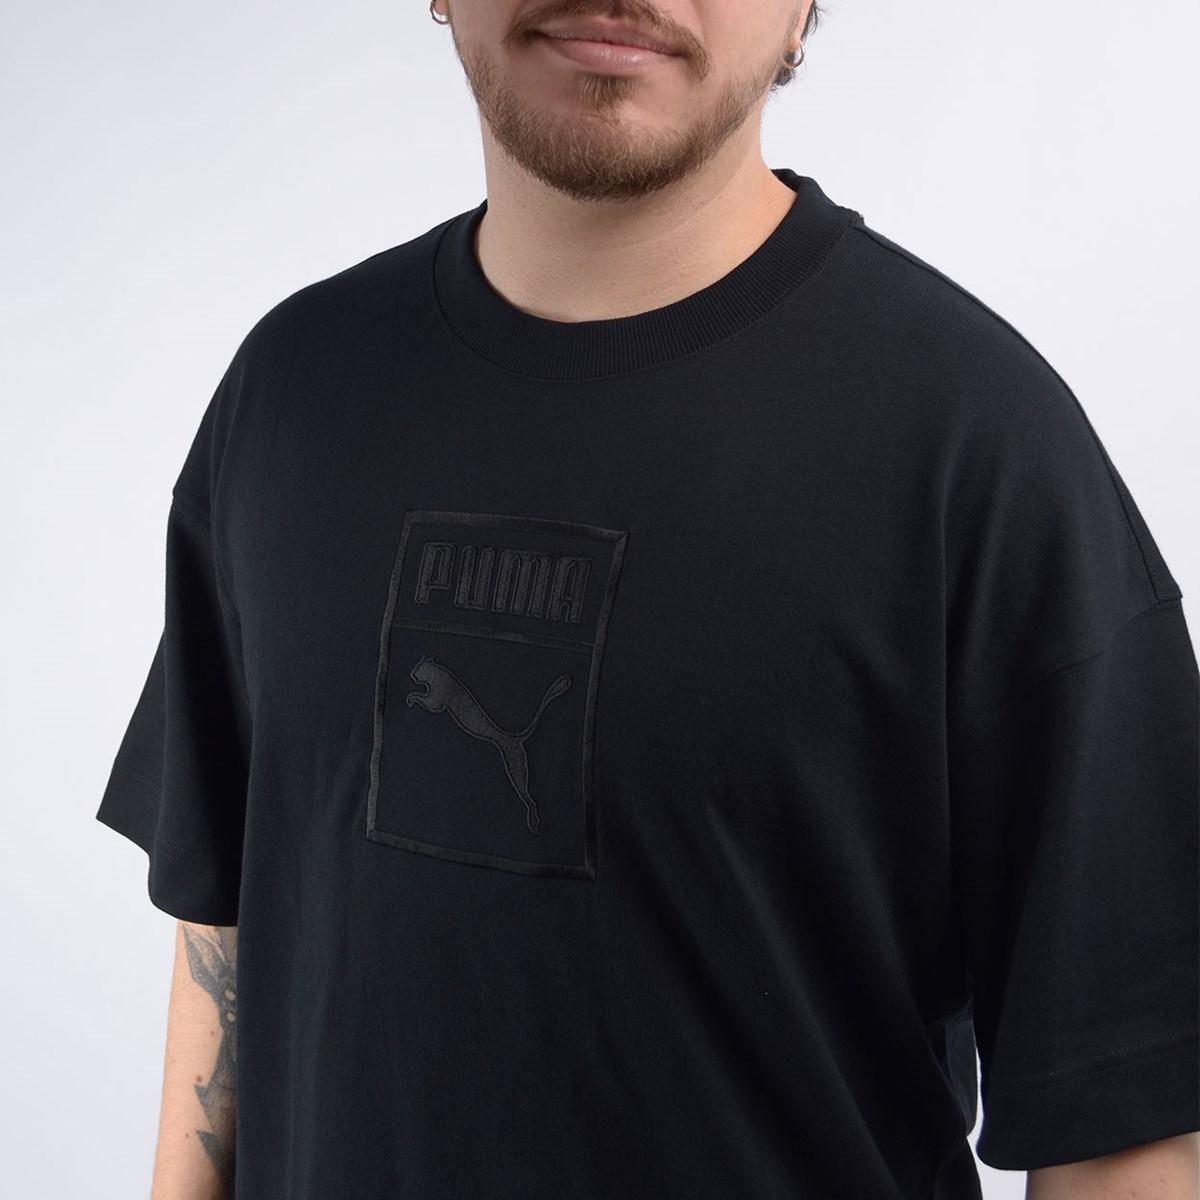 Camiseta Puma Masculina Downtown Tee Black 57671201